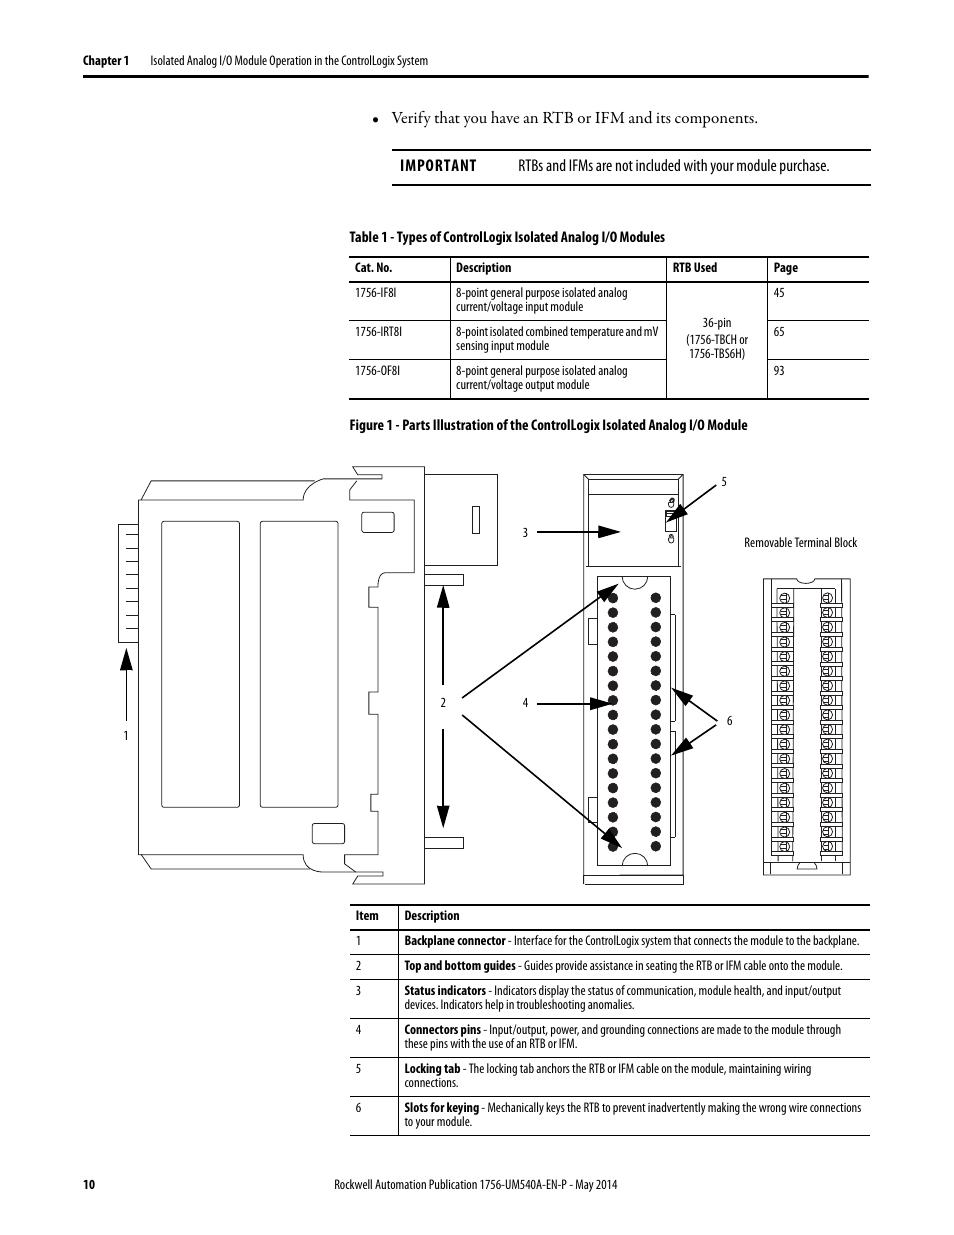 [DIAGRAM] 1756 Ob16e Wiring Diagram FULL Version HD